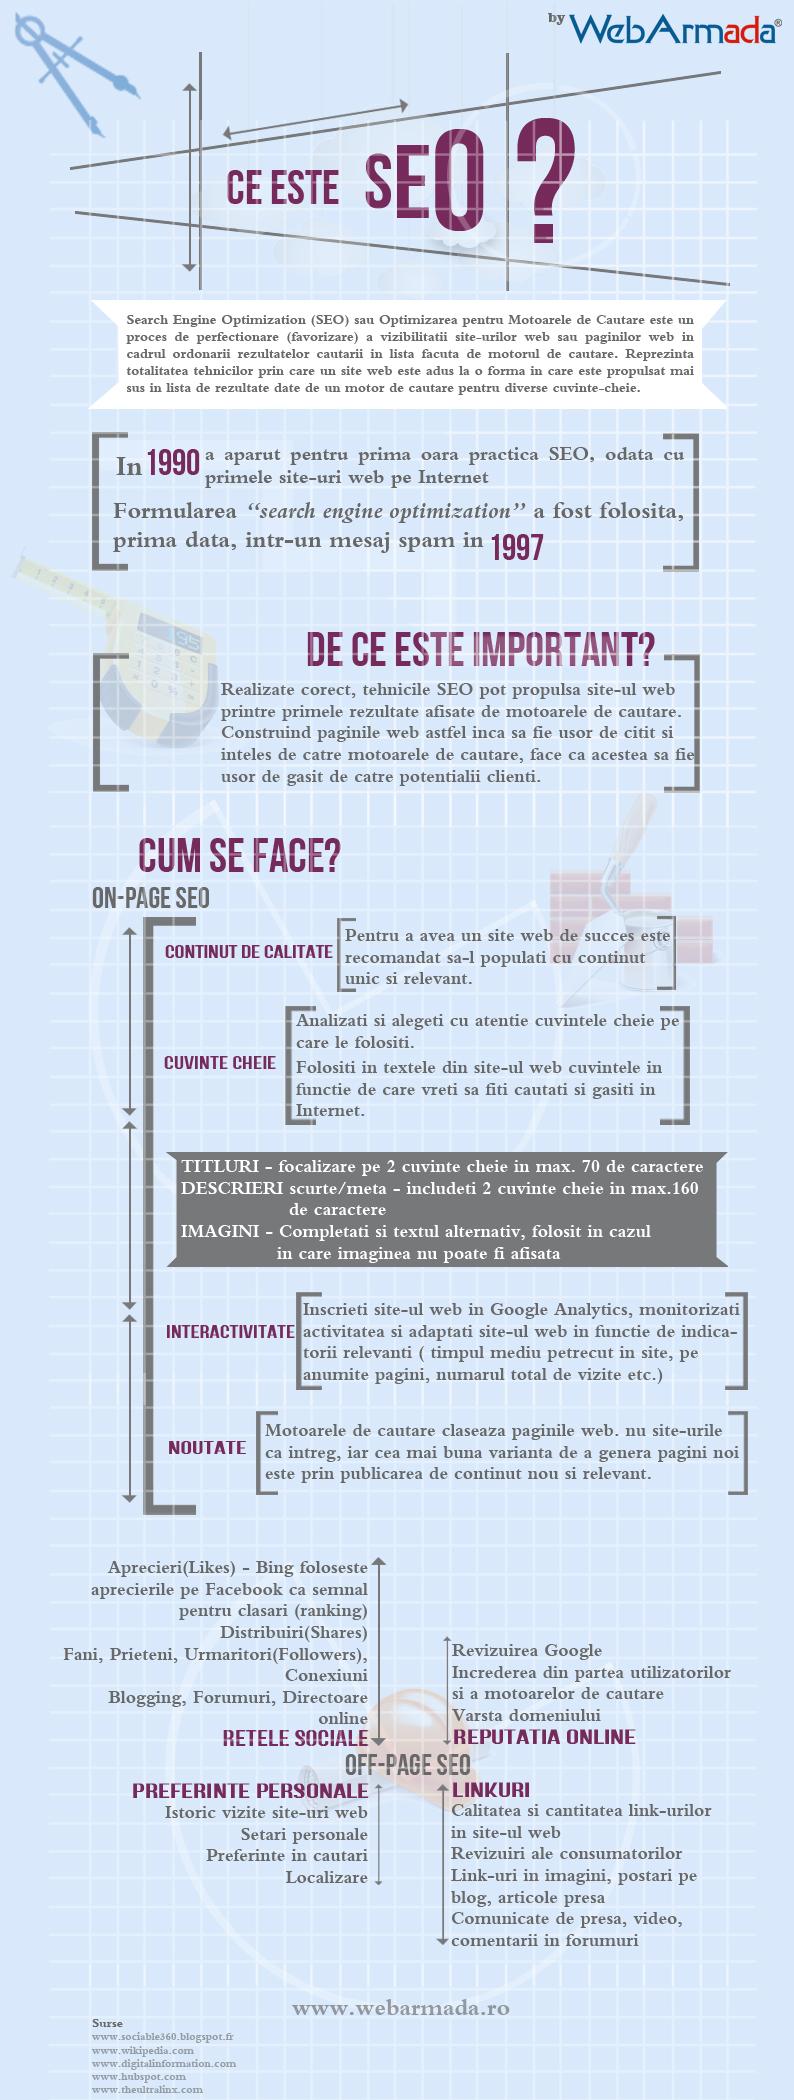 Infographic-ce-este-SEO